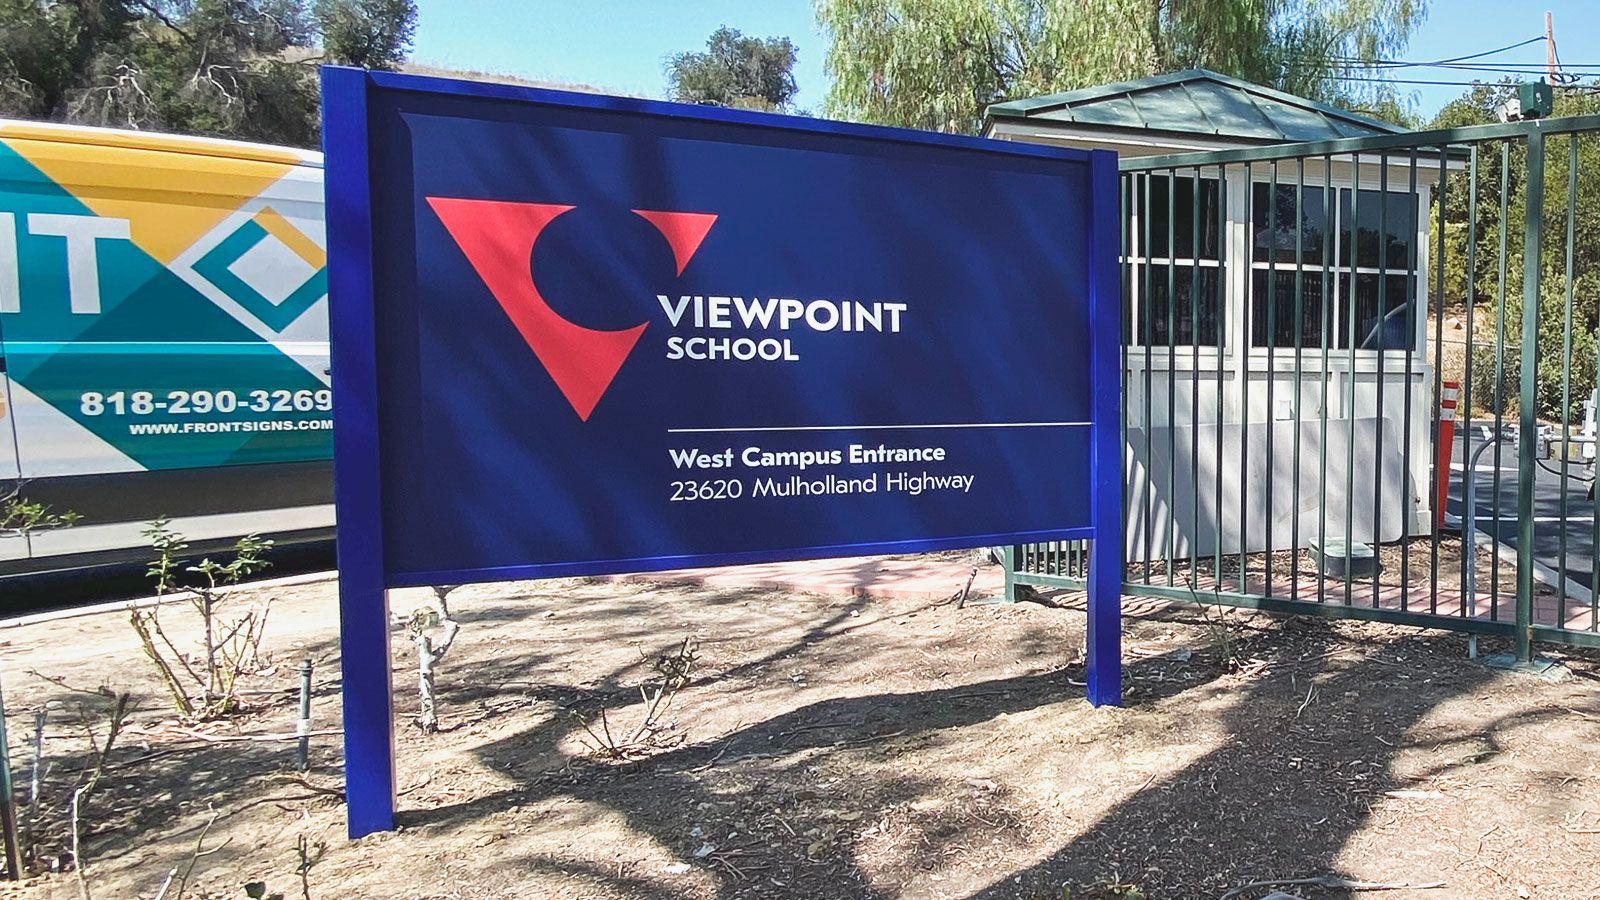 Viewpoint school dibond sign